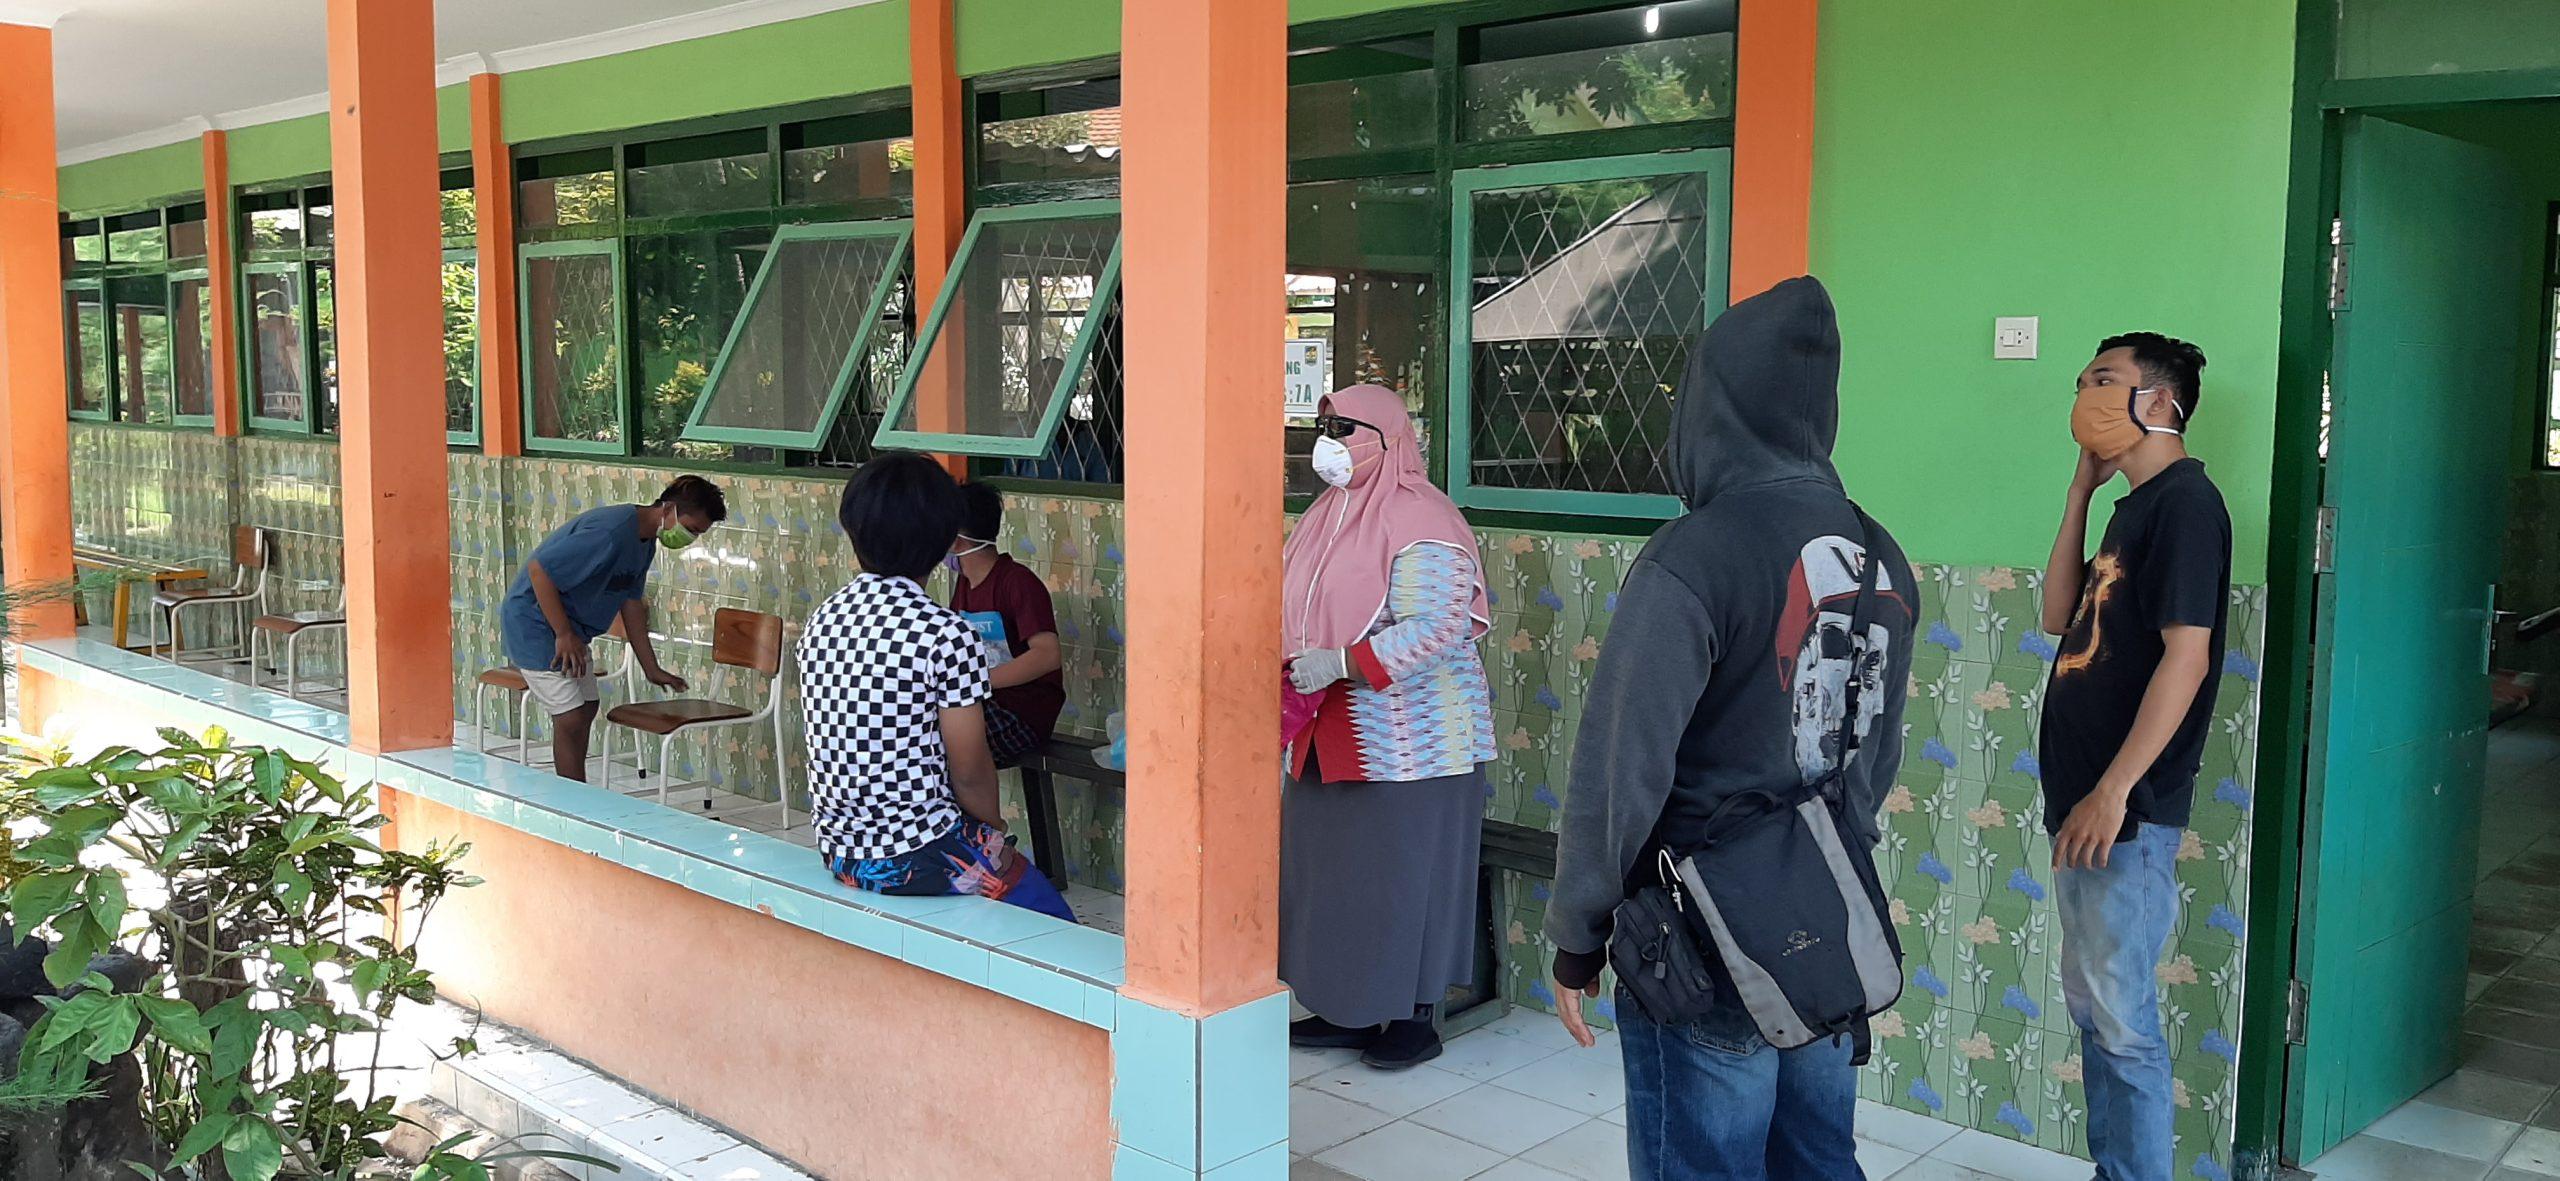 Warga Dikarantina di SMPN 1 Gending Kabupaten Probolinggo Mengeluh Kelaparan